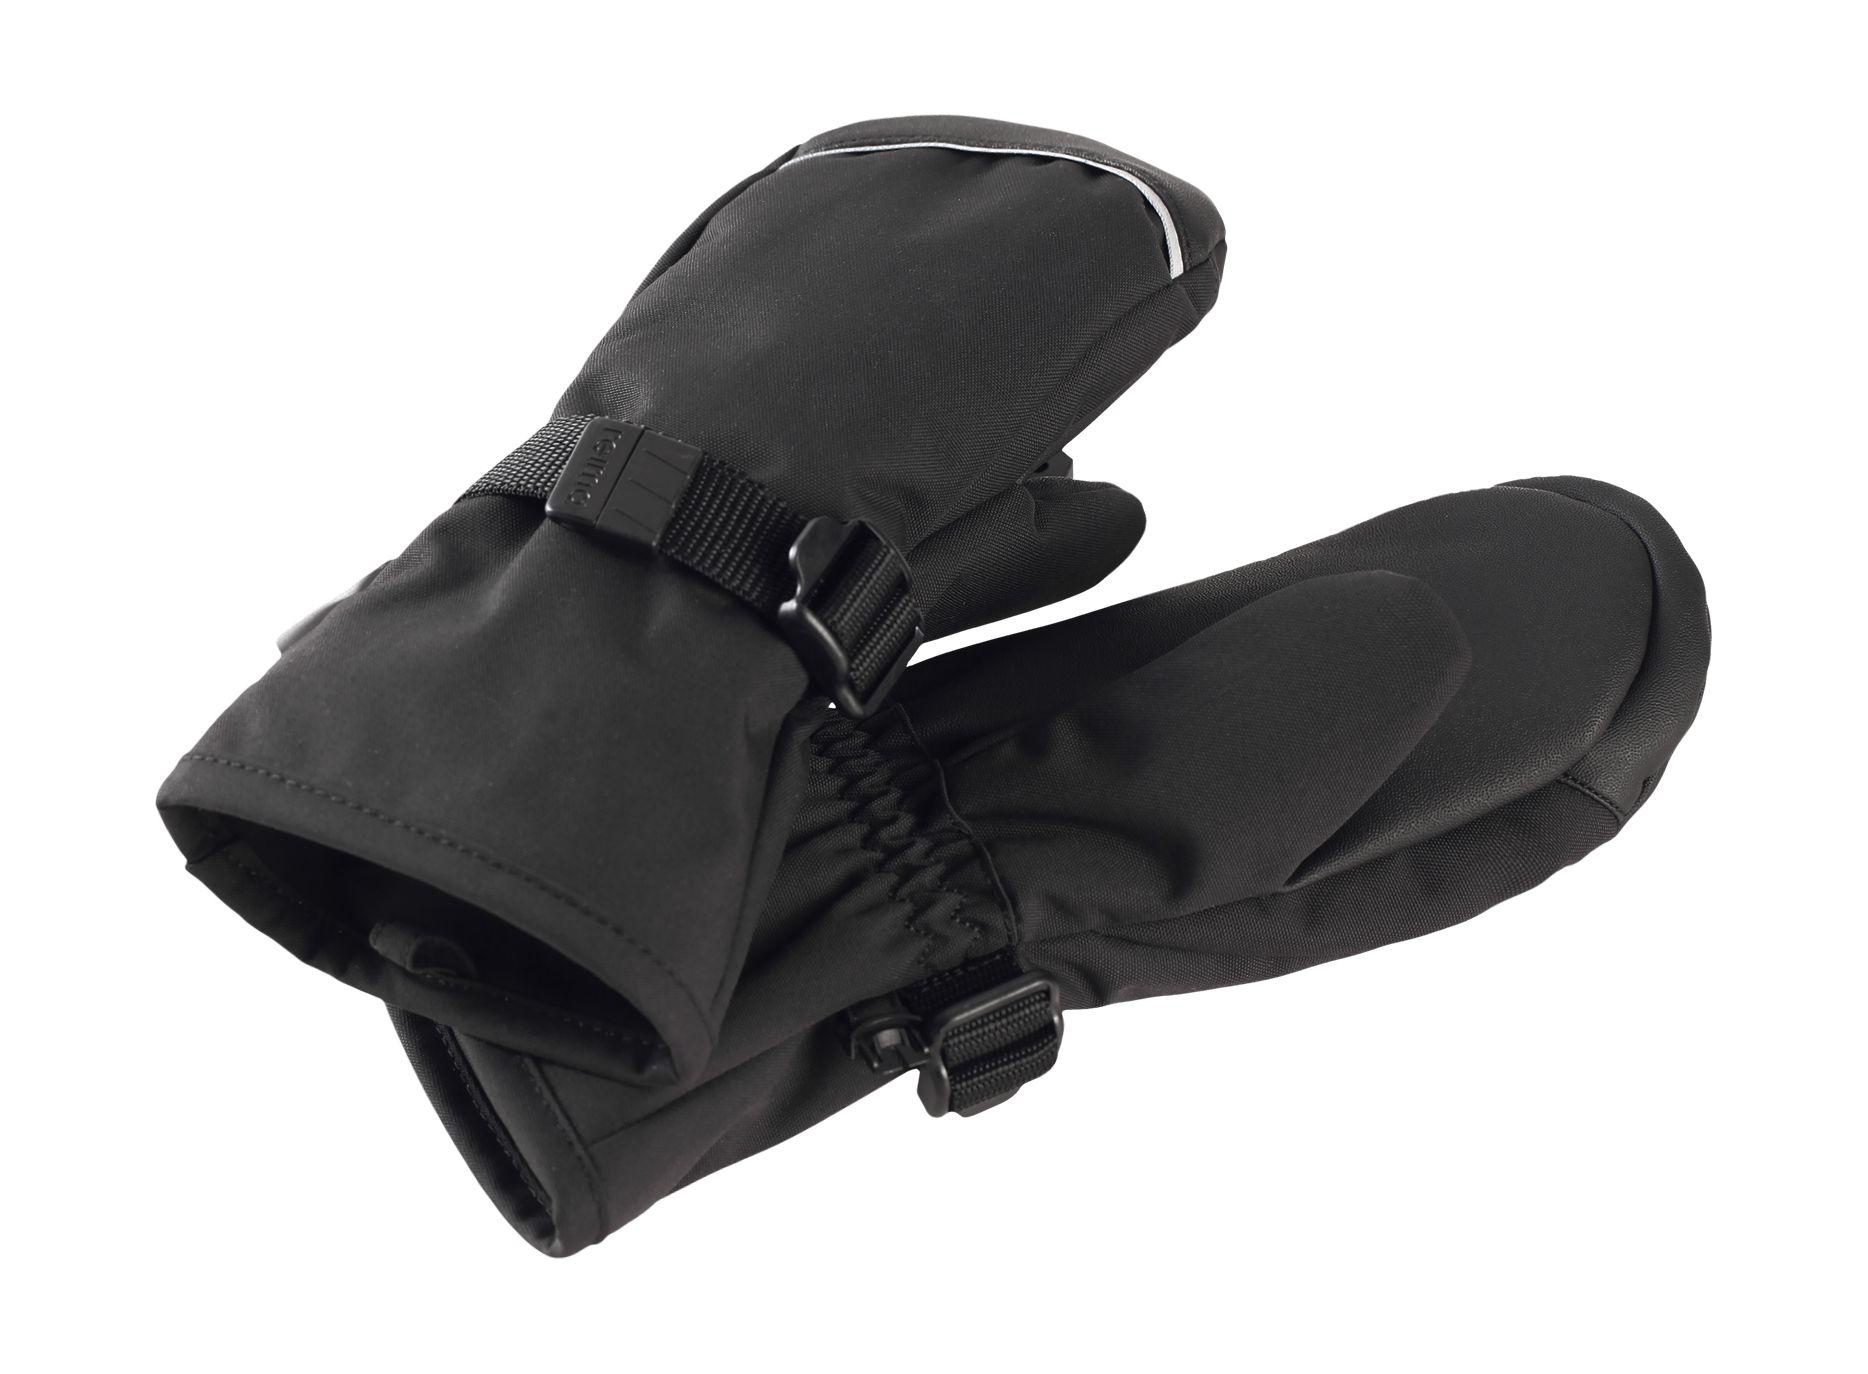 REIMA Suunta Black 5